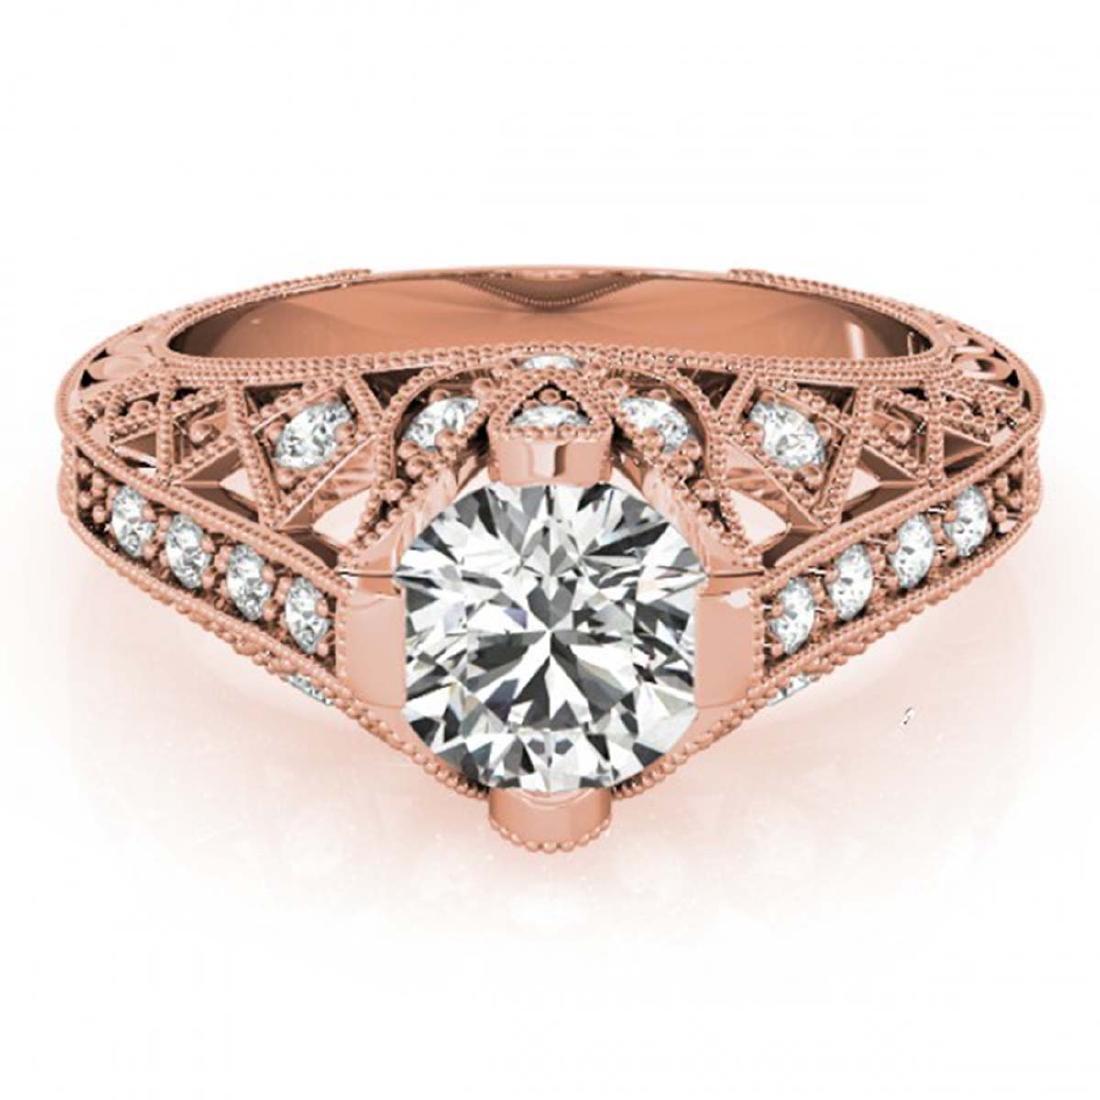 1.25 ctw VS/SI Diamond Ring 14K Rose Gold - REF-271R3K